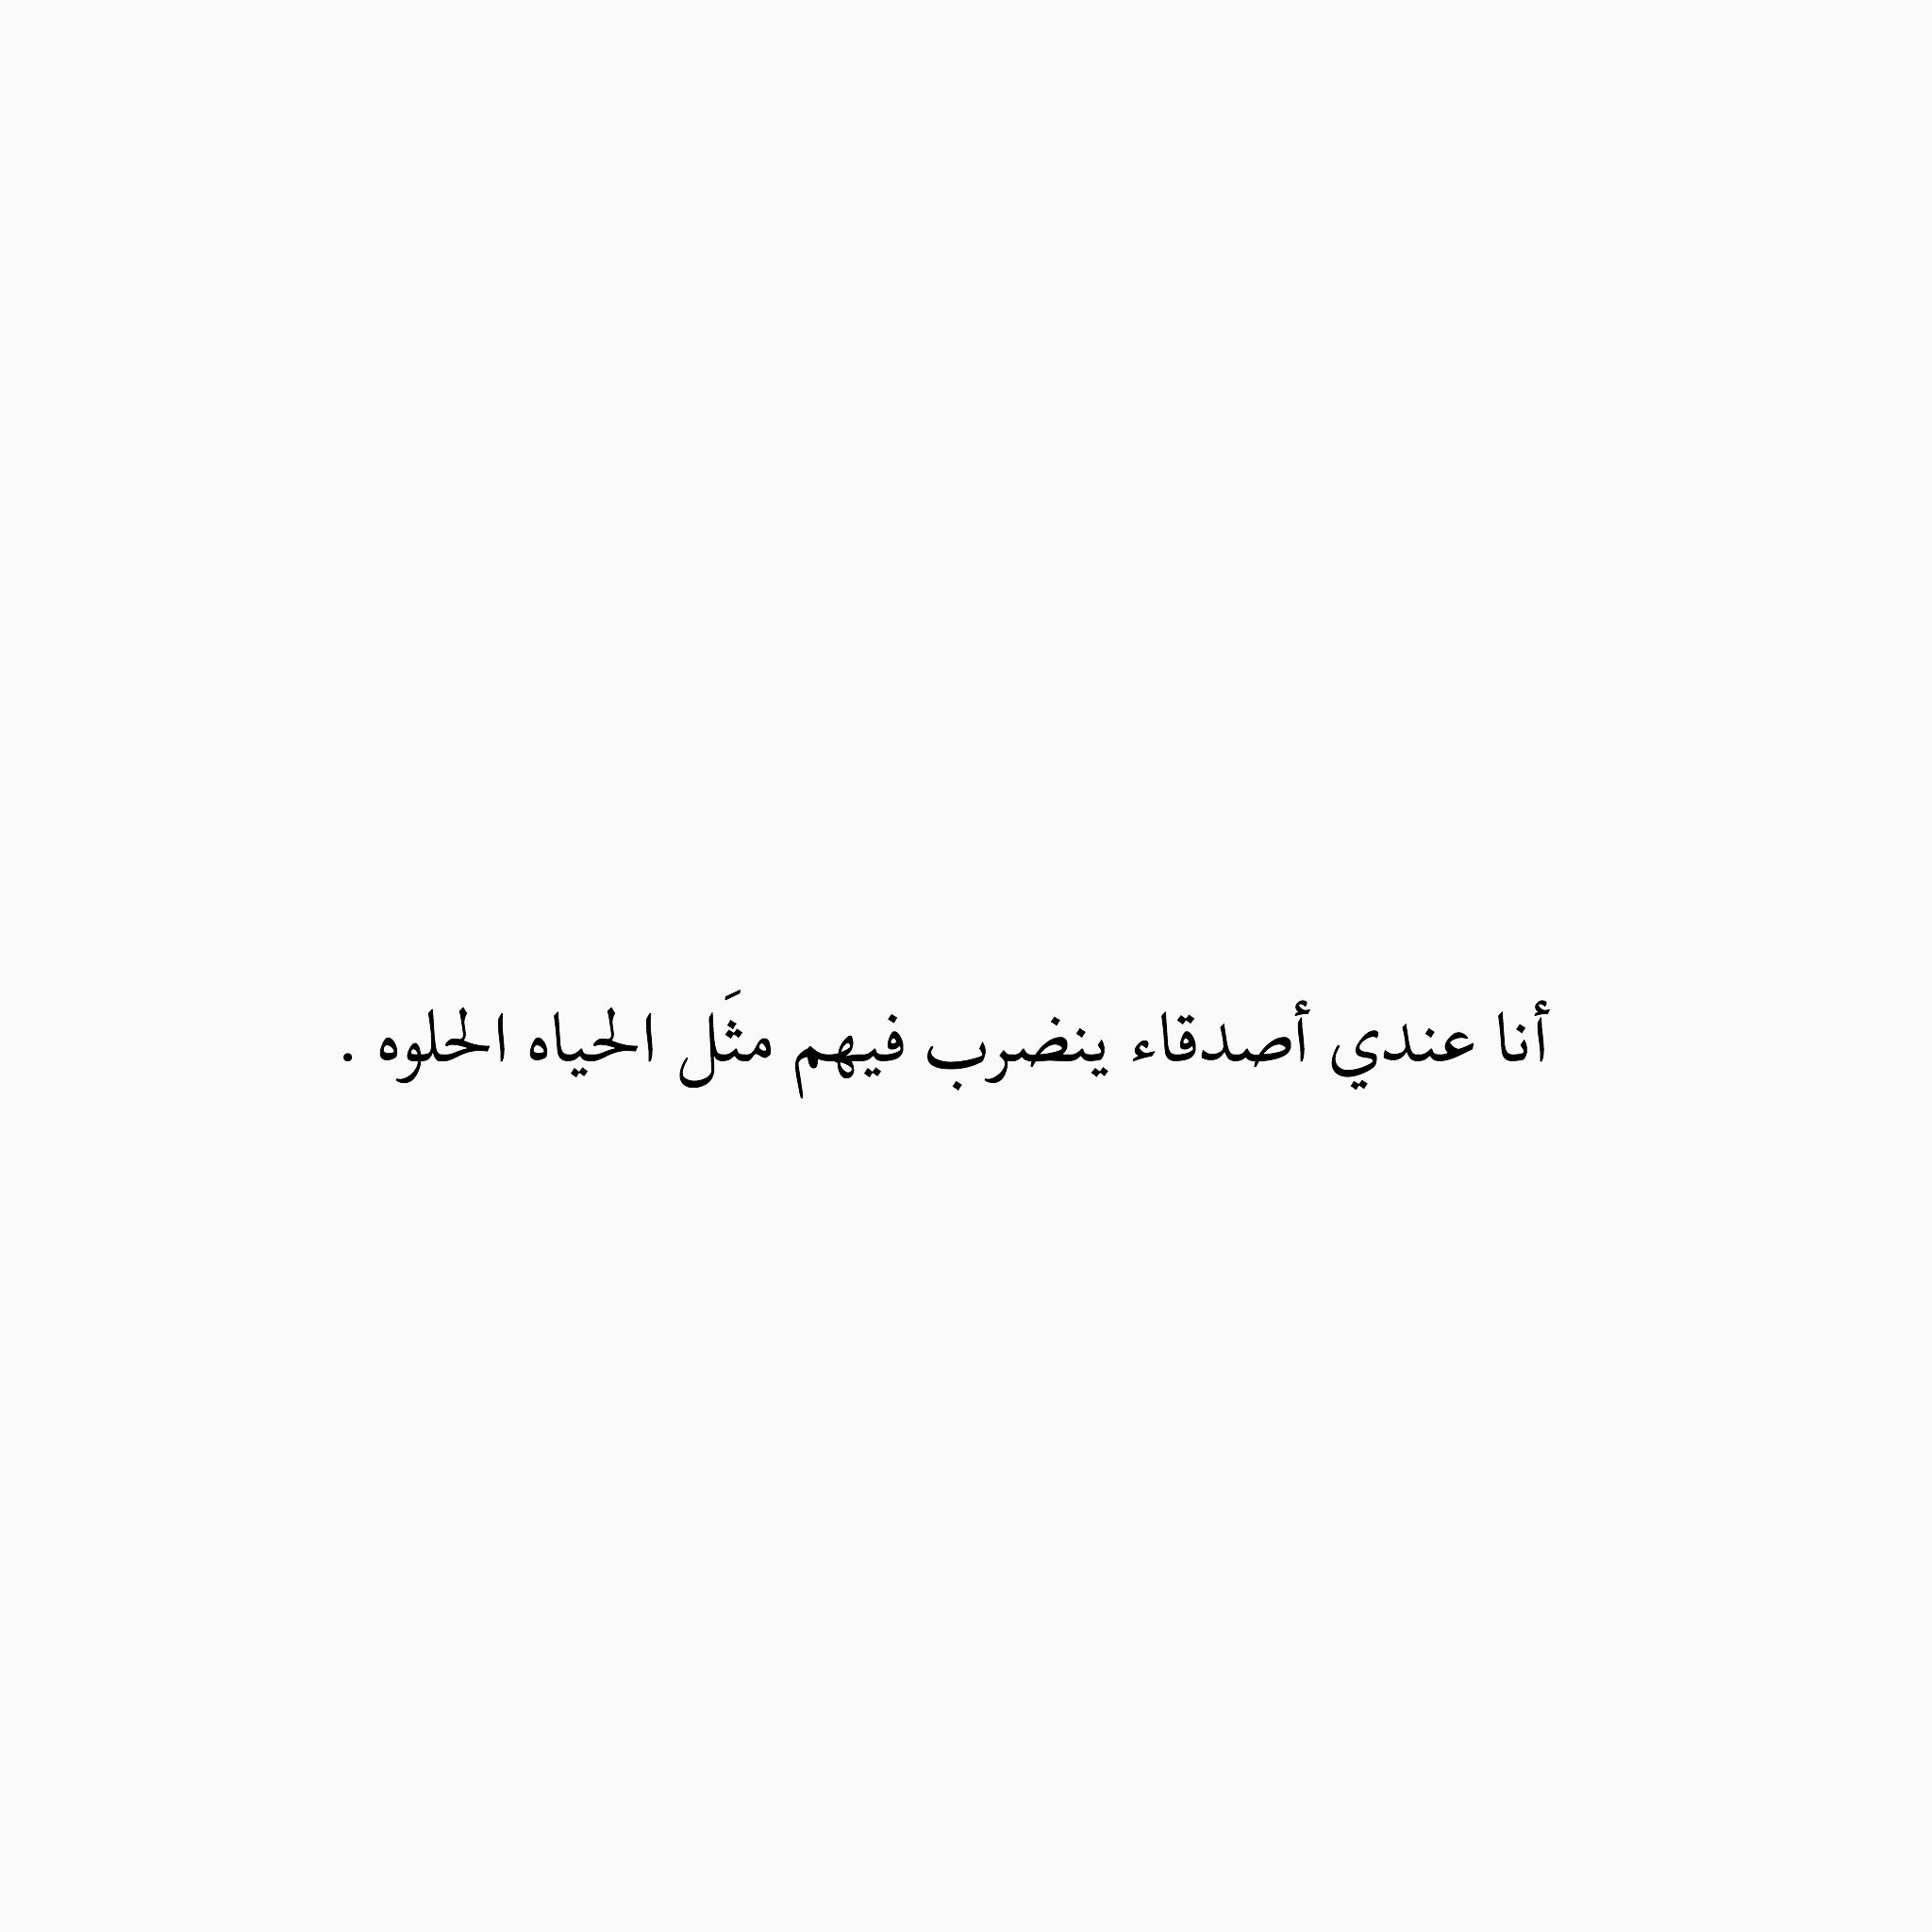 Pin by Tasneem Attallah on أصدقاء | Arabic quotes